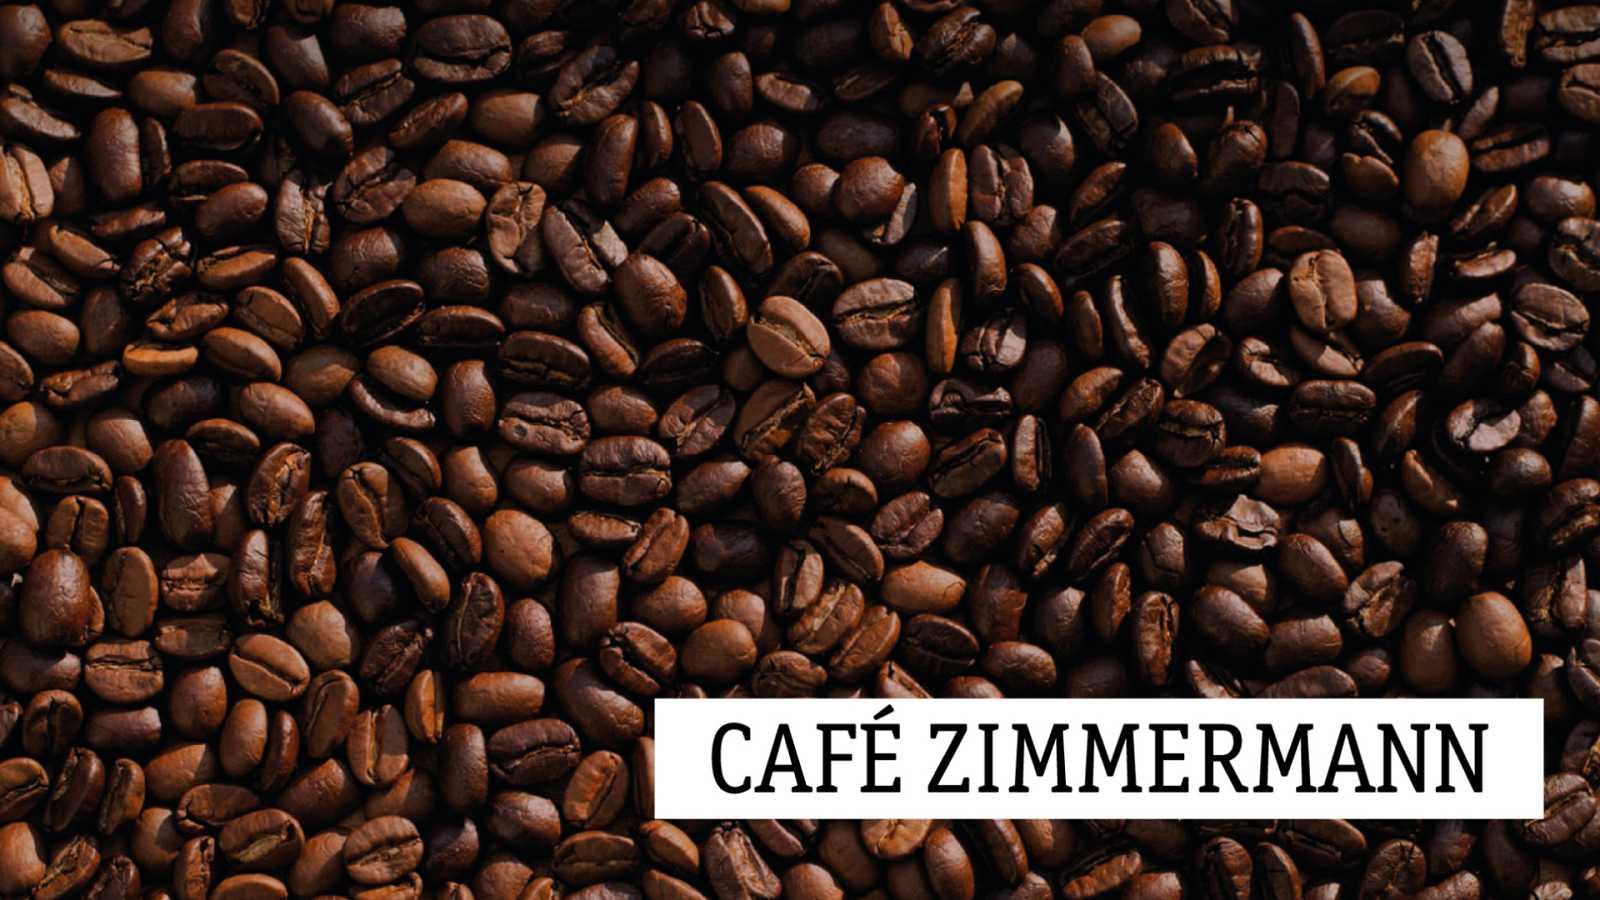 Café Zimmermann - Pablo Ferrández y Luis del Valle - 06/11/20 - escuchar ahora